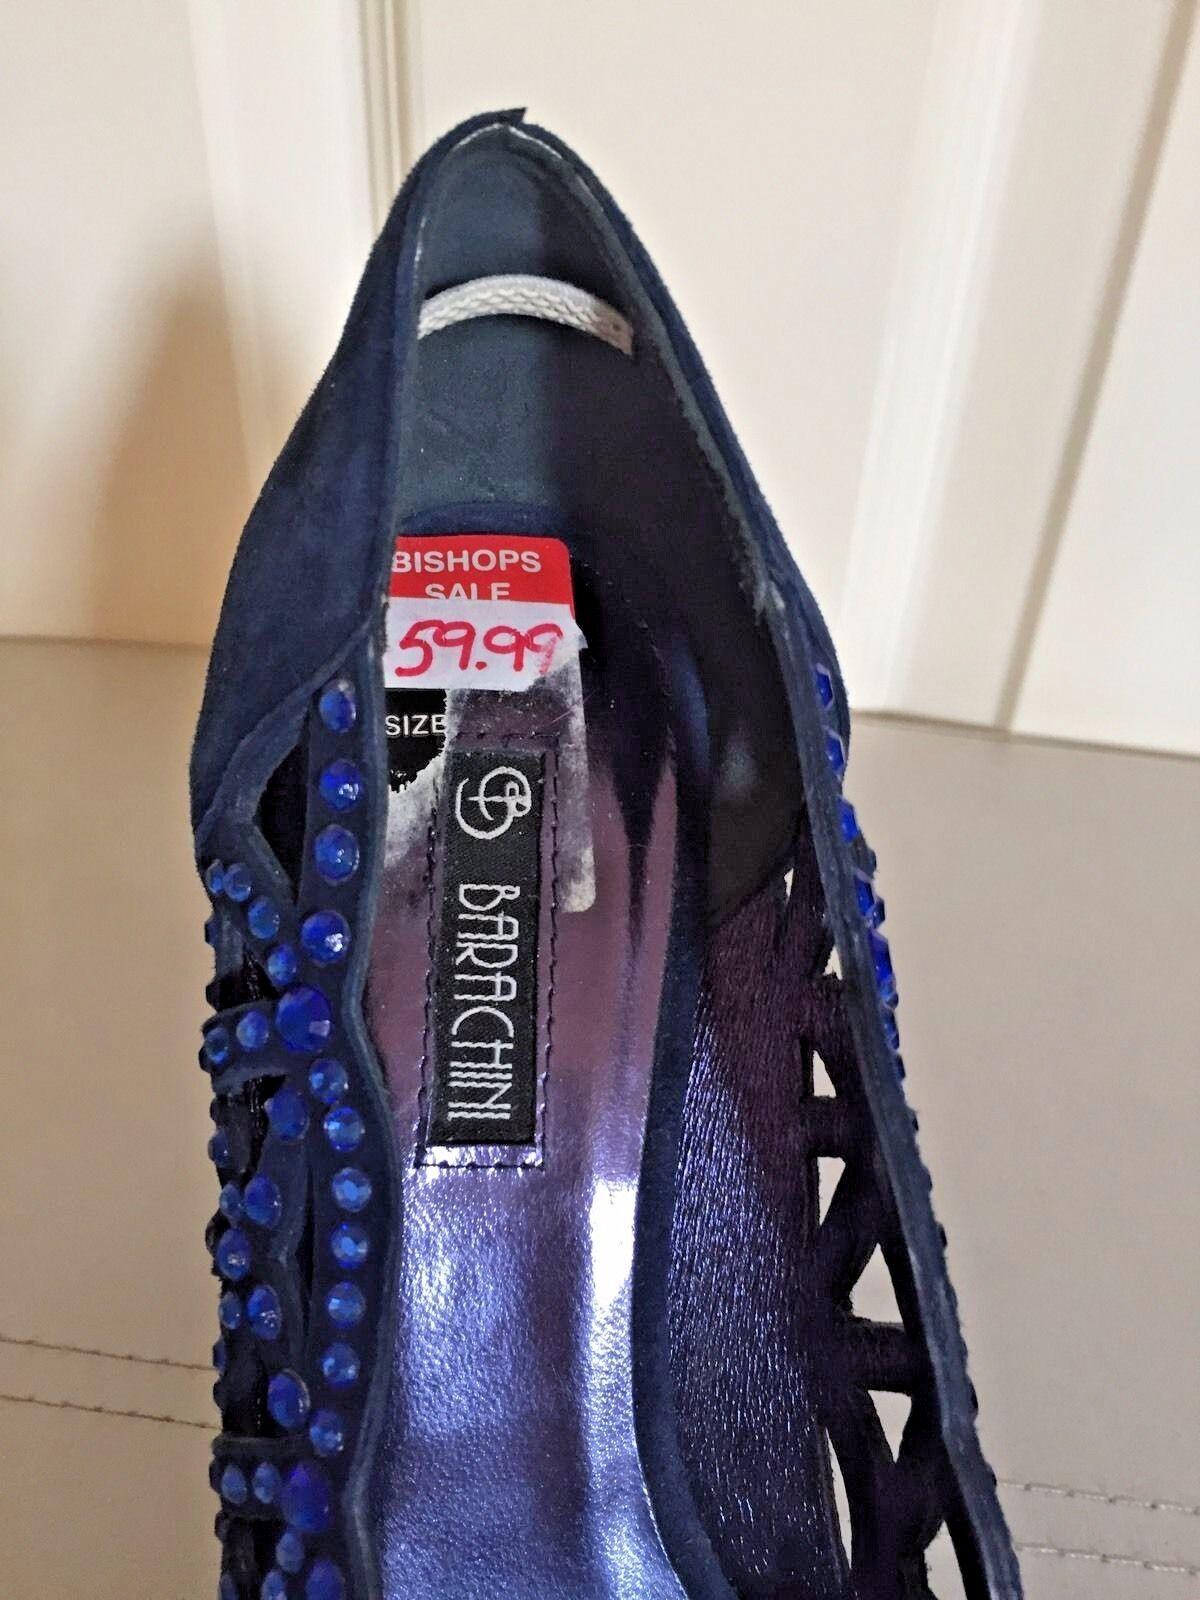 BARACHINI EU Blau SUEDE Schuhe, STUDDED/ STONES/ SIZE UK 3, EU BARACHINI 36/ DRESSY PEEP TOES aec659